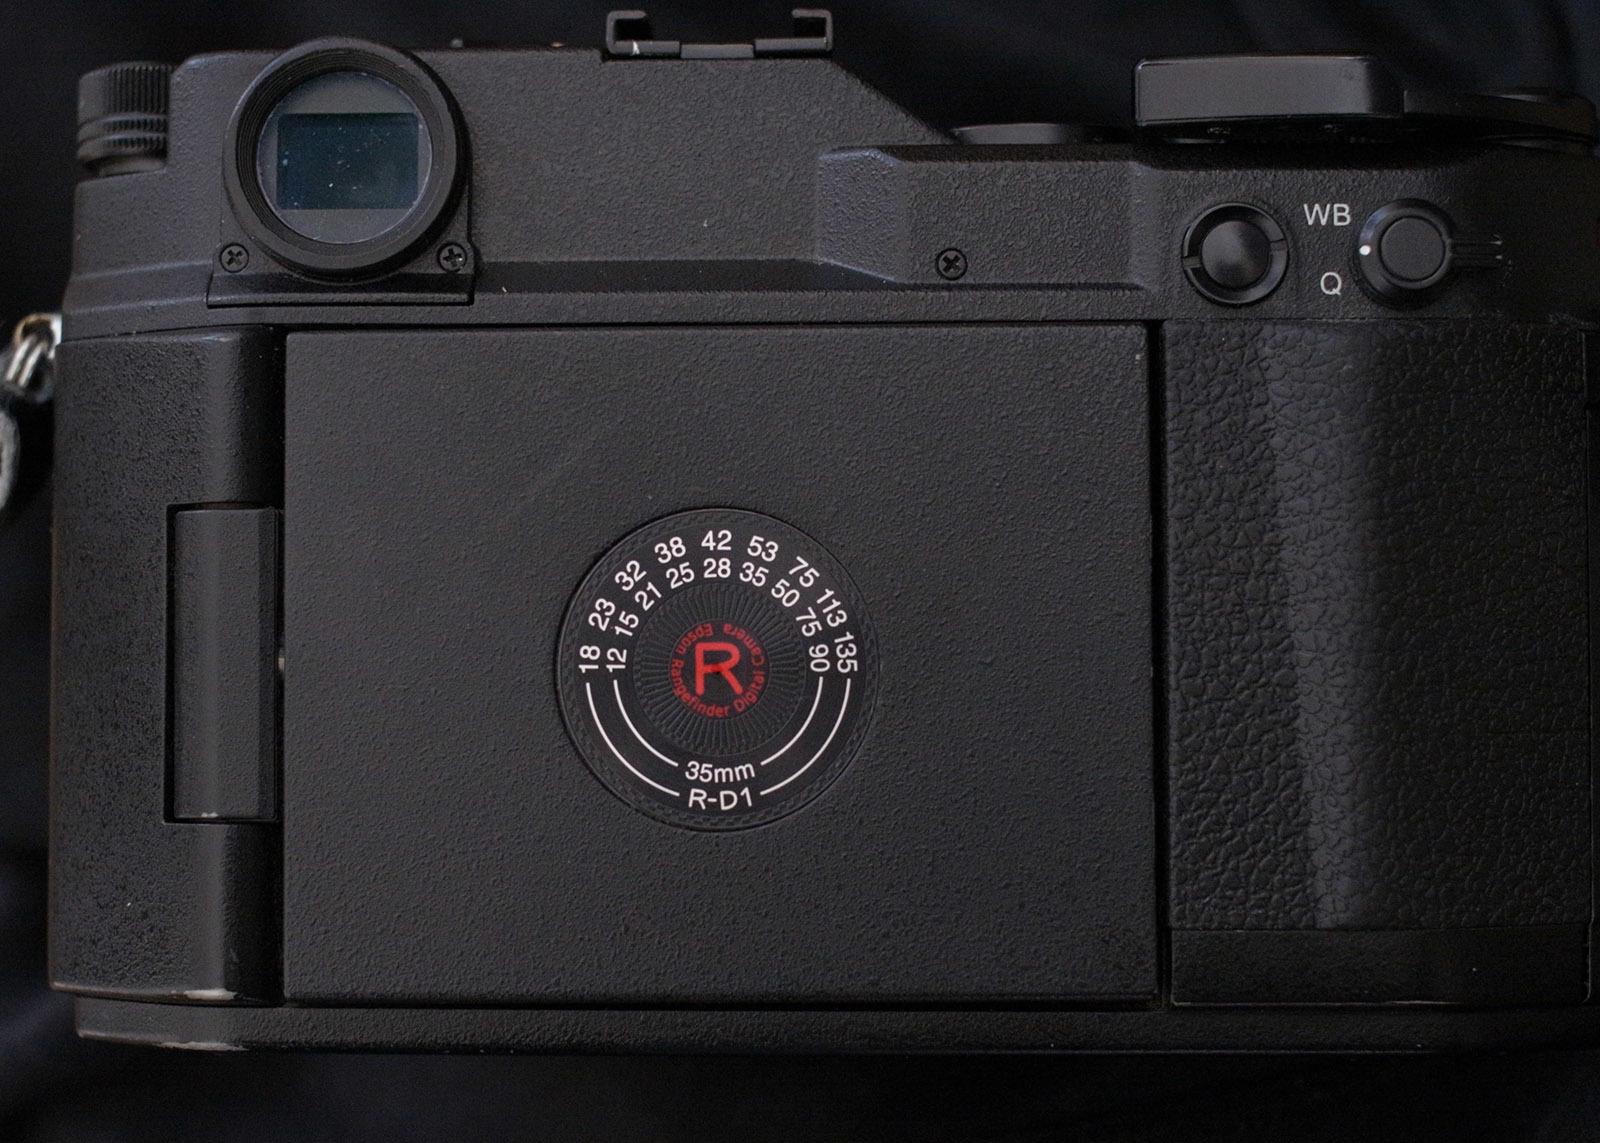 Epson Rangefinder Digital Camera R-D1s_e0367501_14091289.jpg